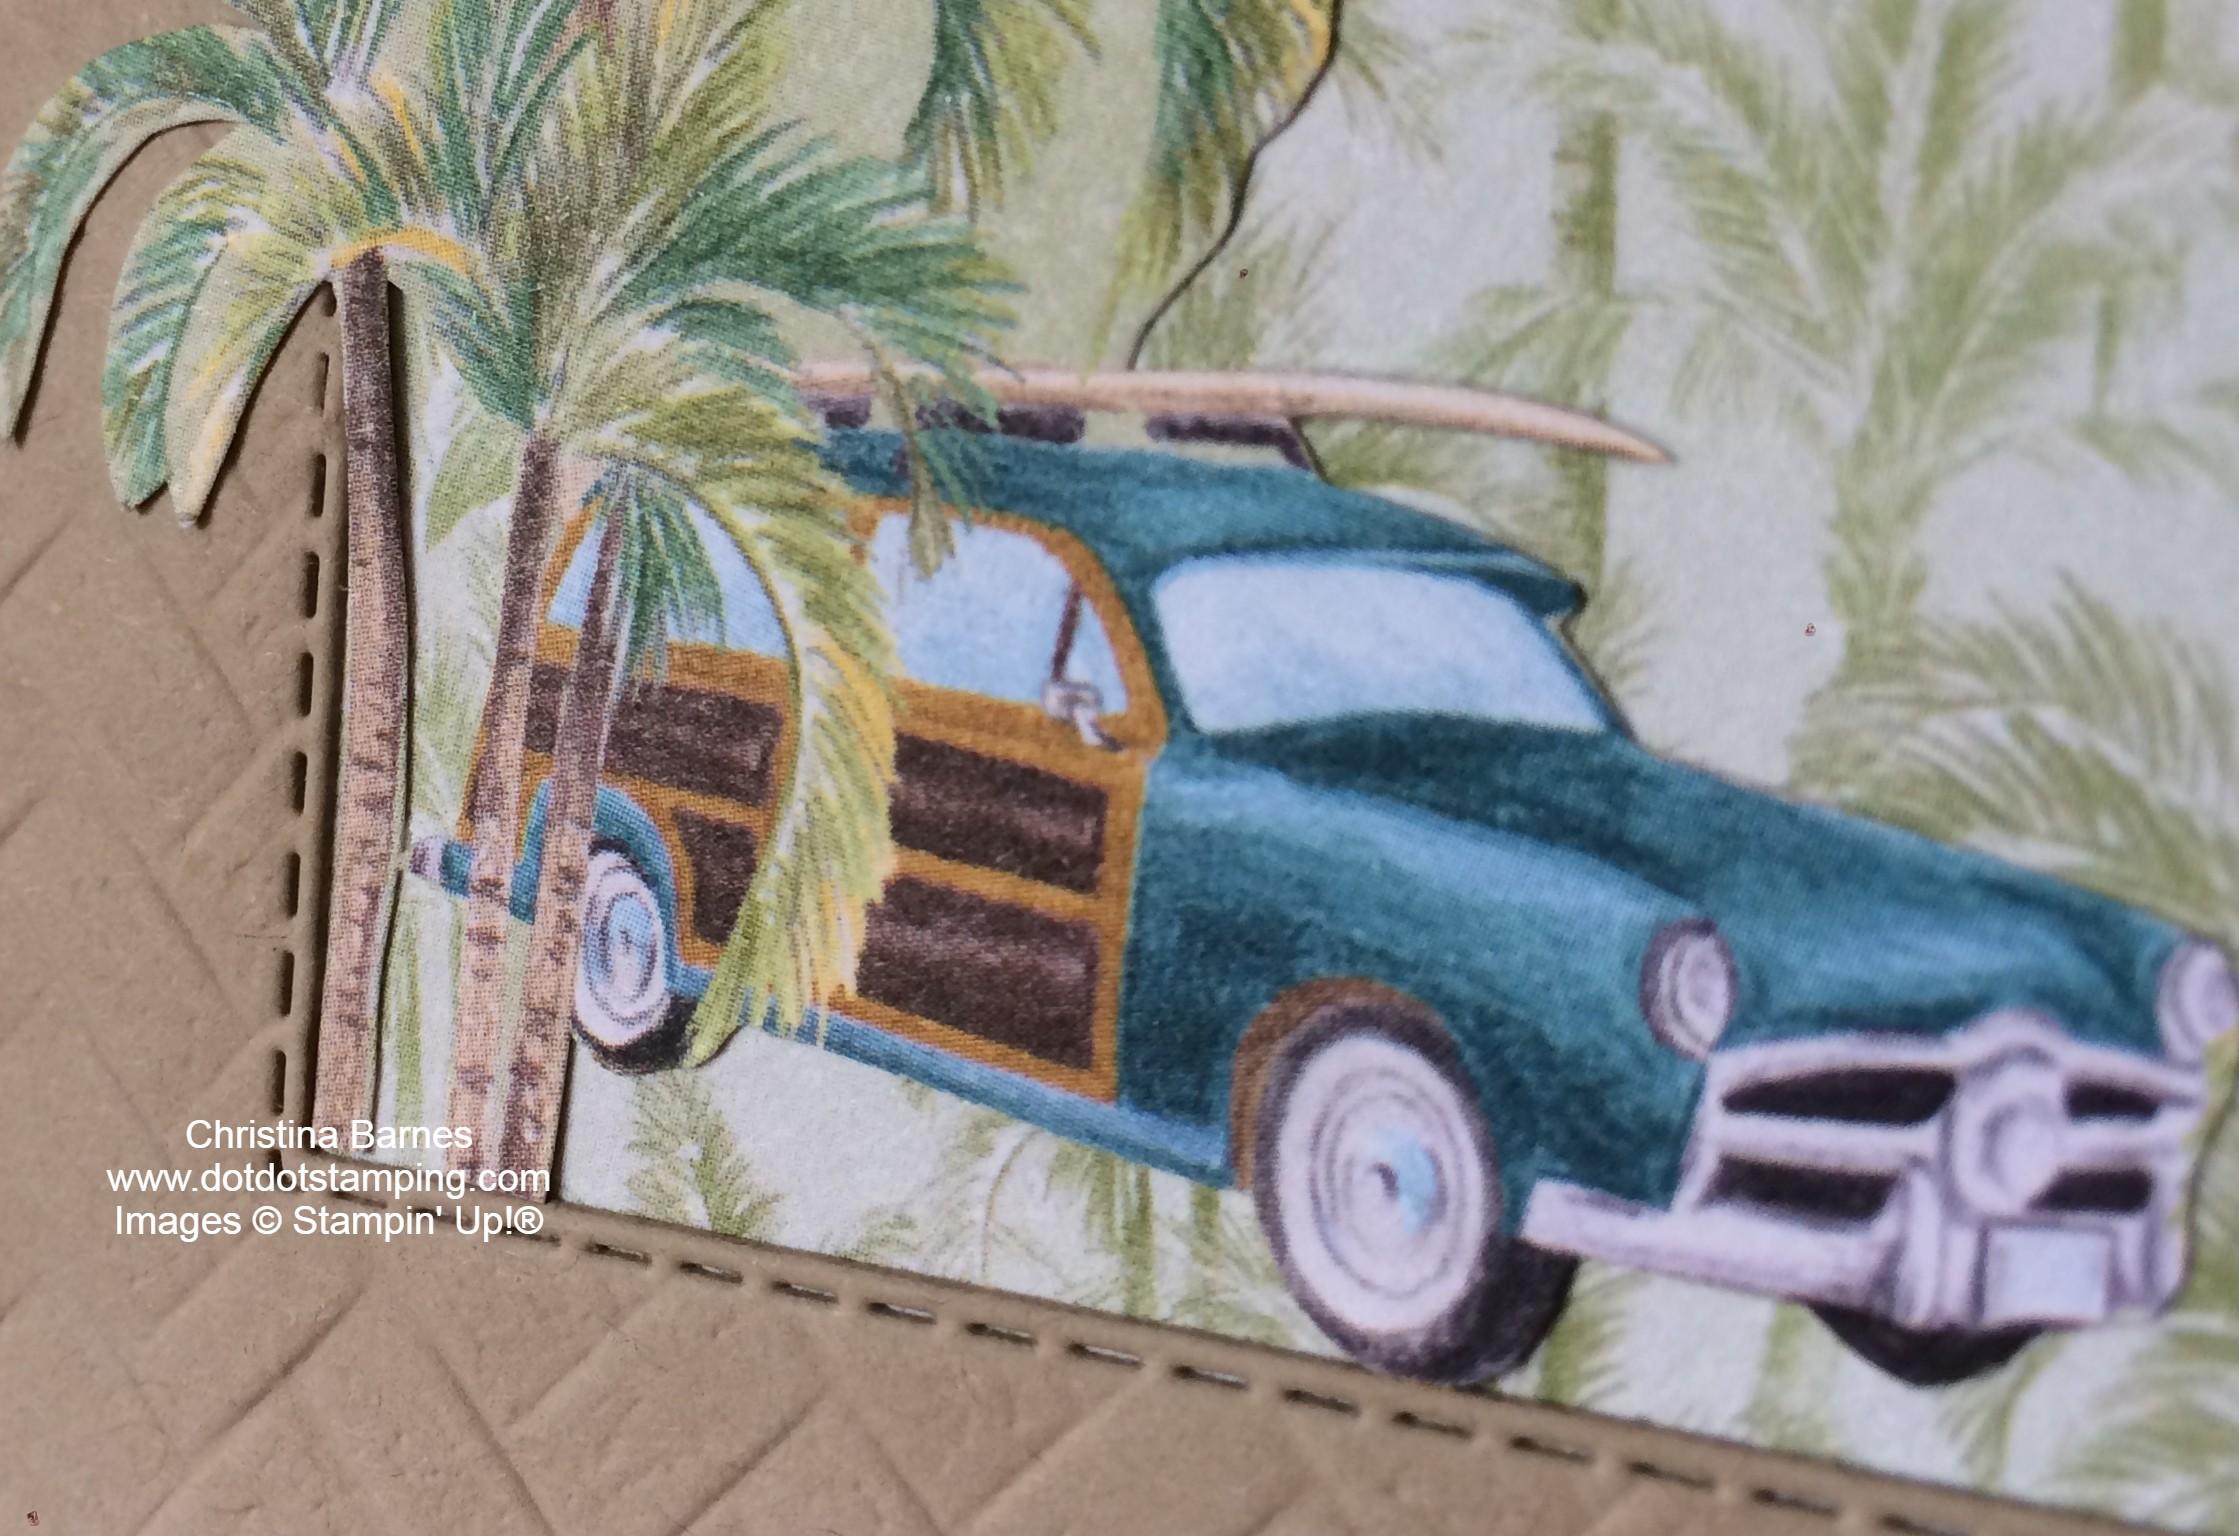 Tropical Oasis Stampin' Up! Vintage Car Christina Barnes Dot Dot Stamping 2